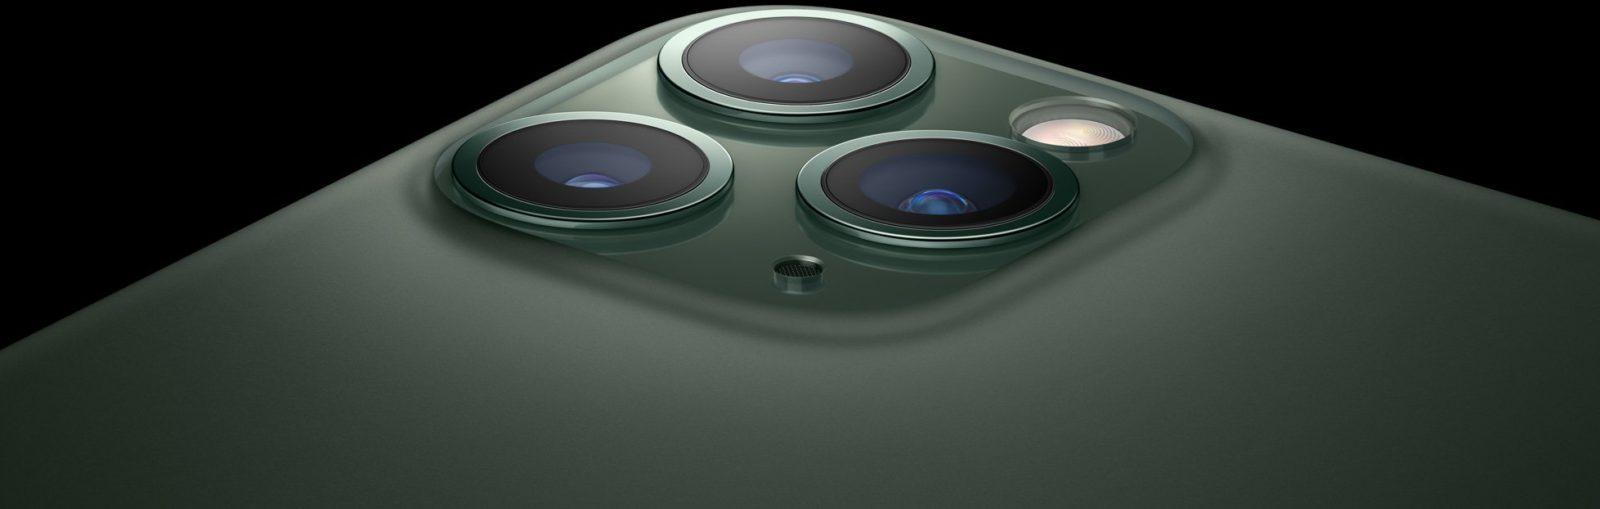 Смартфон iPhone 11 Pro Max 2